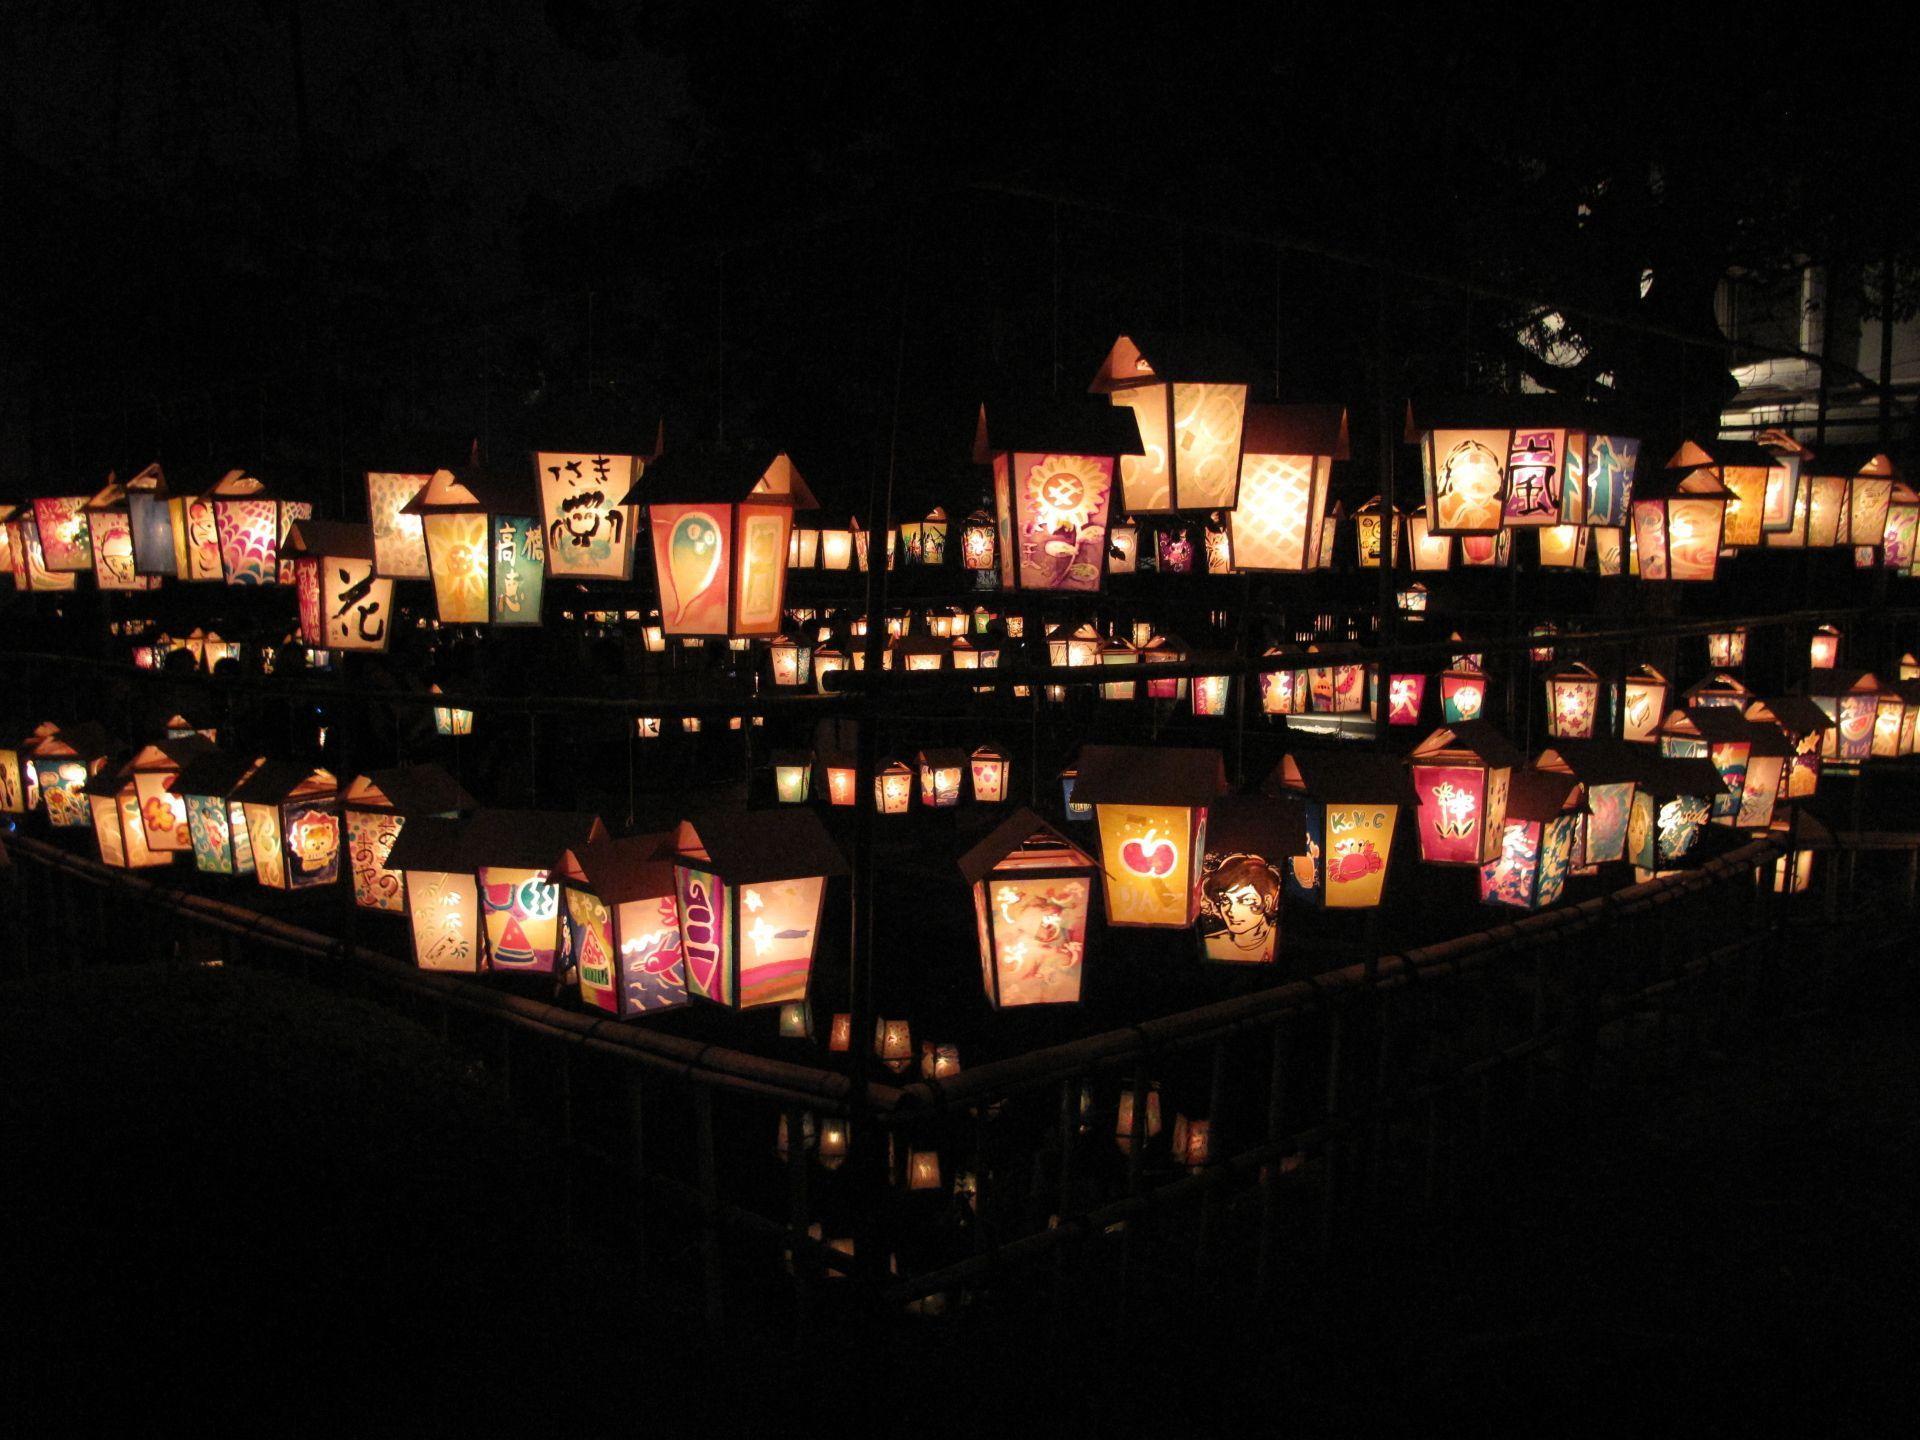 Anese Lantern Festival Wallpapers Top Free